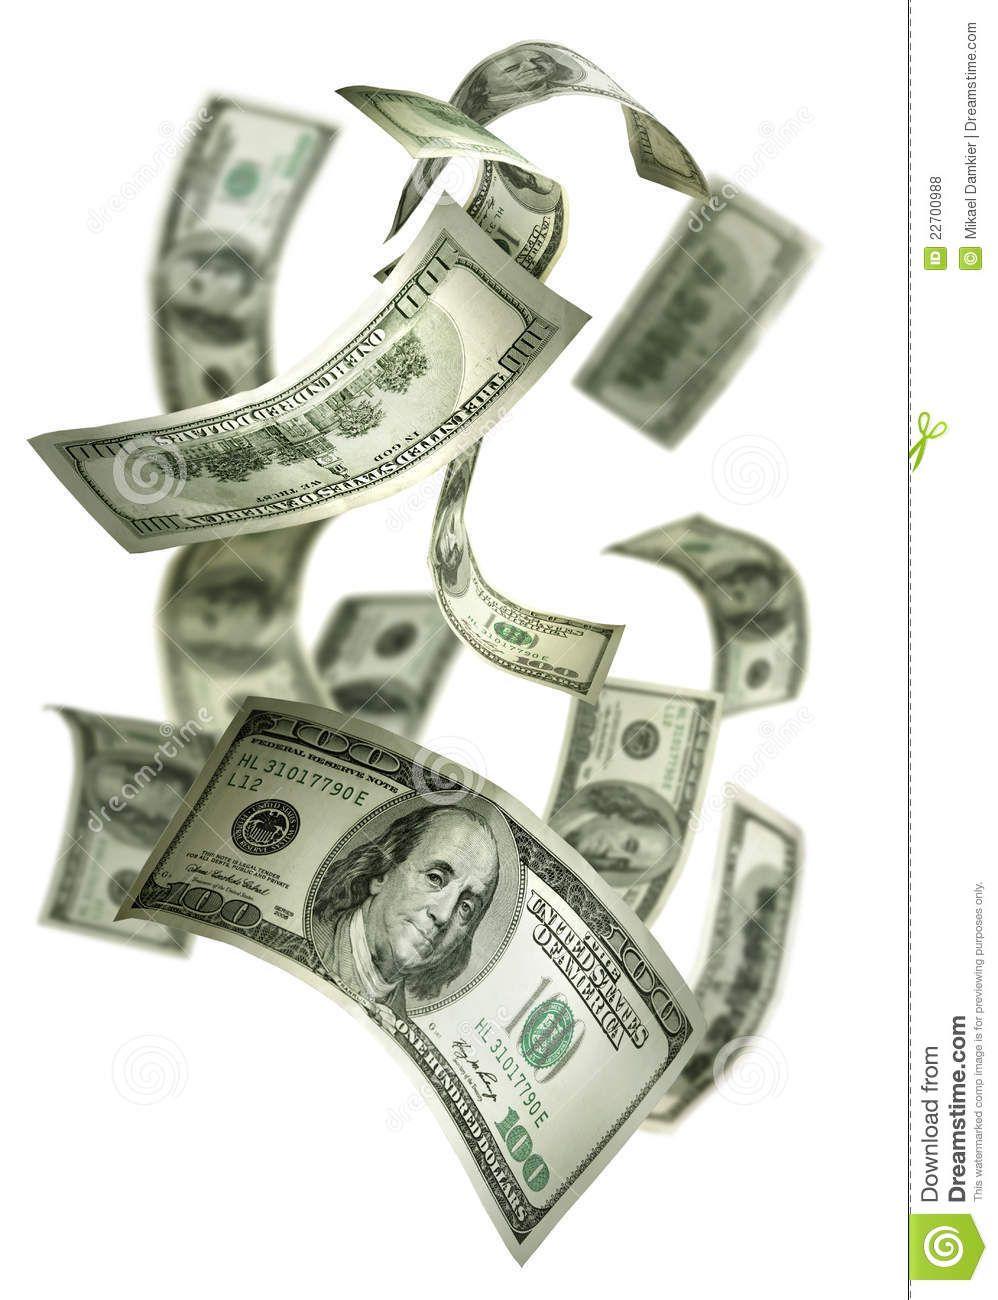 Falling Money 100 Bills Photo Of Falling Money 100 Bills On White Sponsored Advertisement Sponsored Money Phot In 2020 Banknotes Design Money Tattoo Money